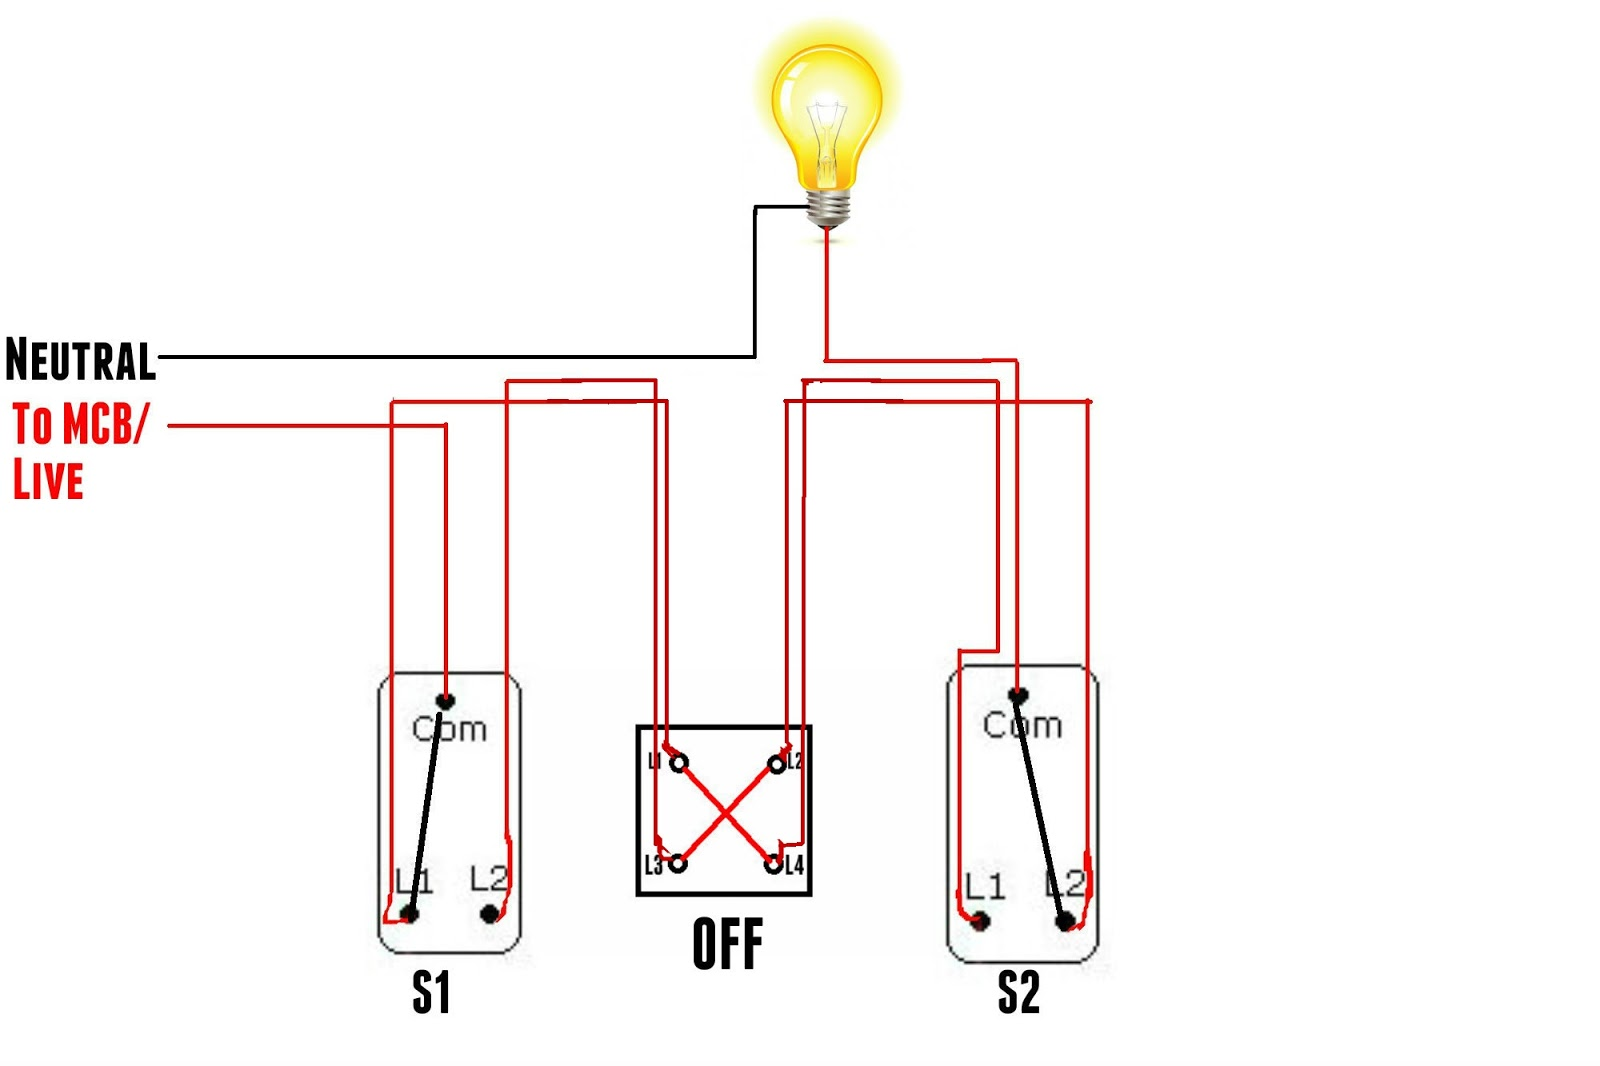 intermediate switch wiring diagram nz sabs trailer plug 5 core the world through electricity